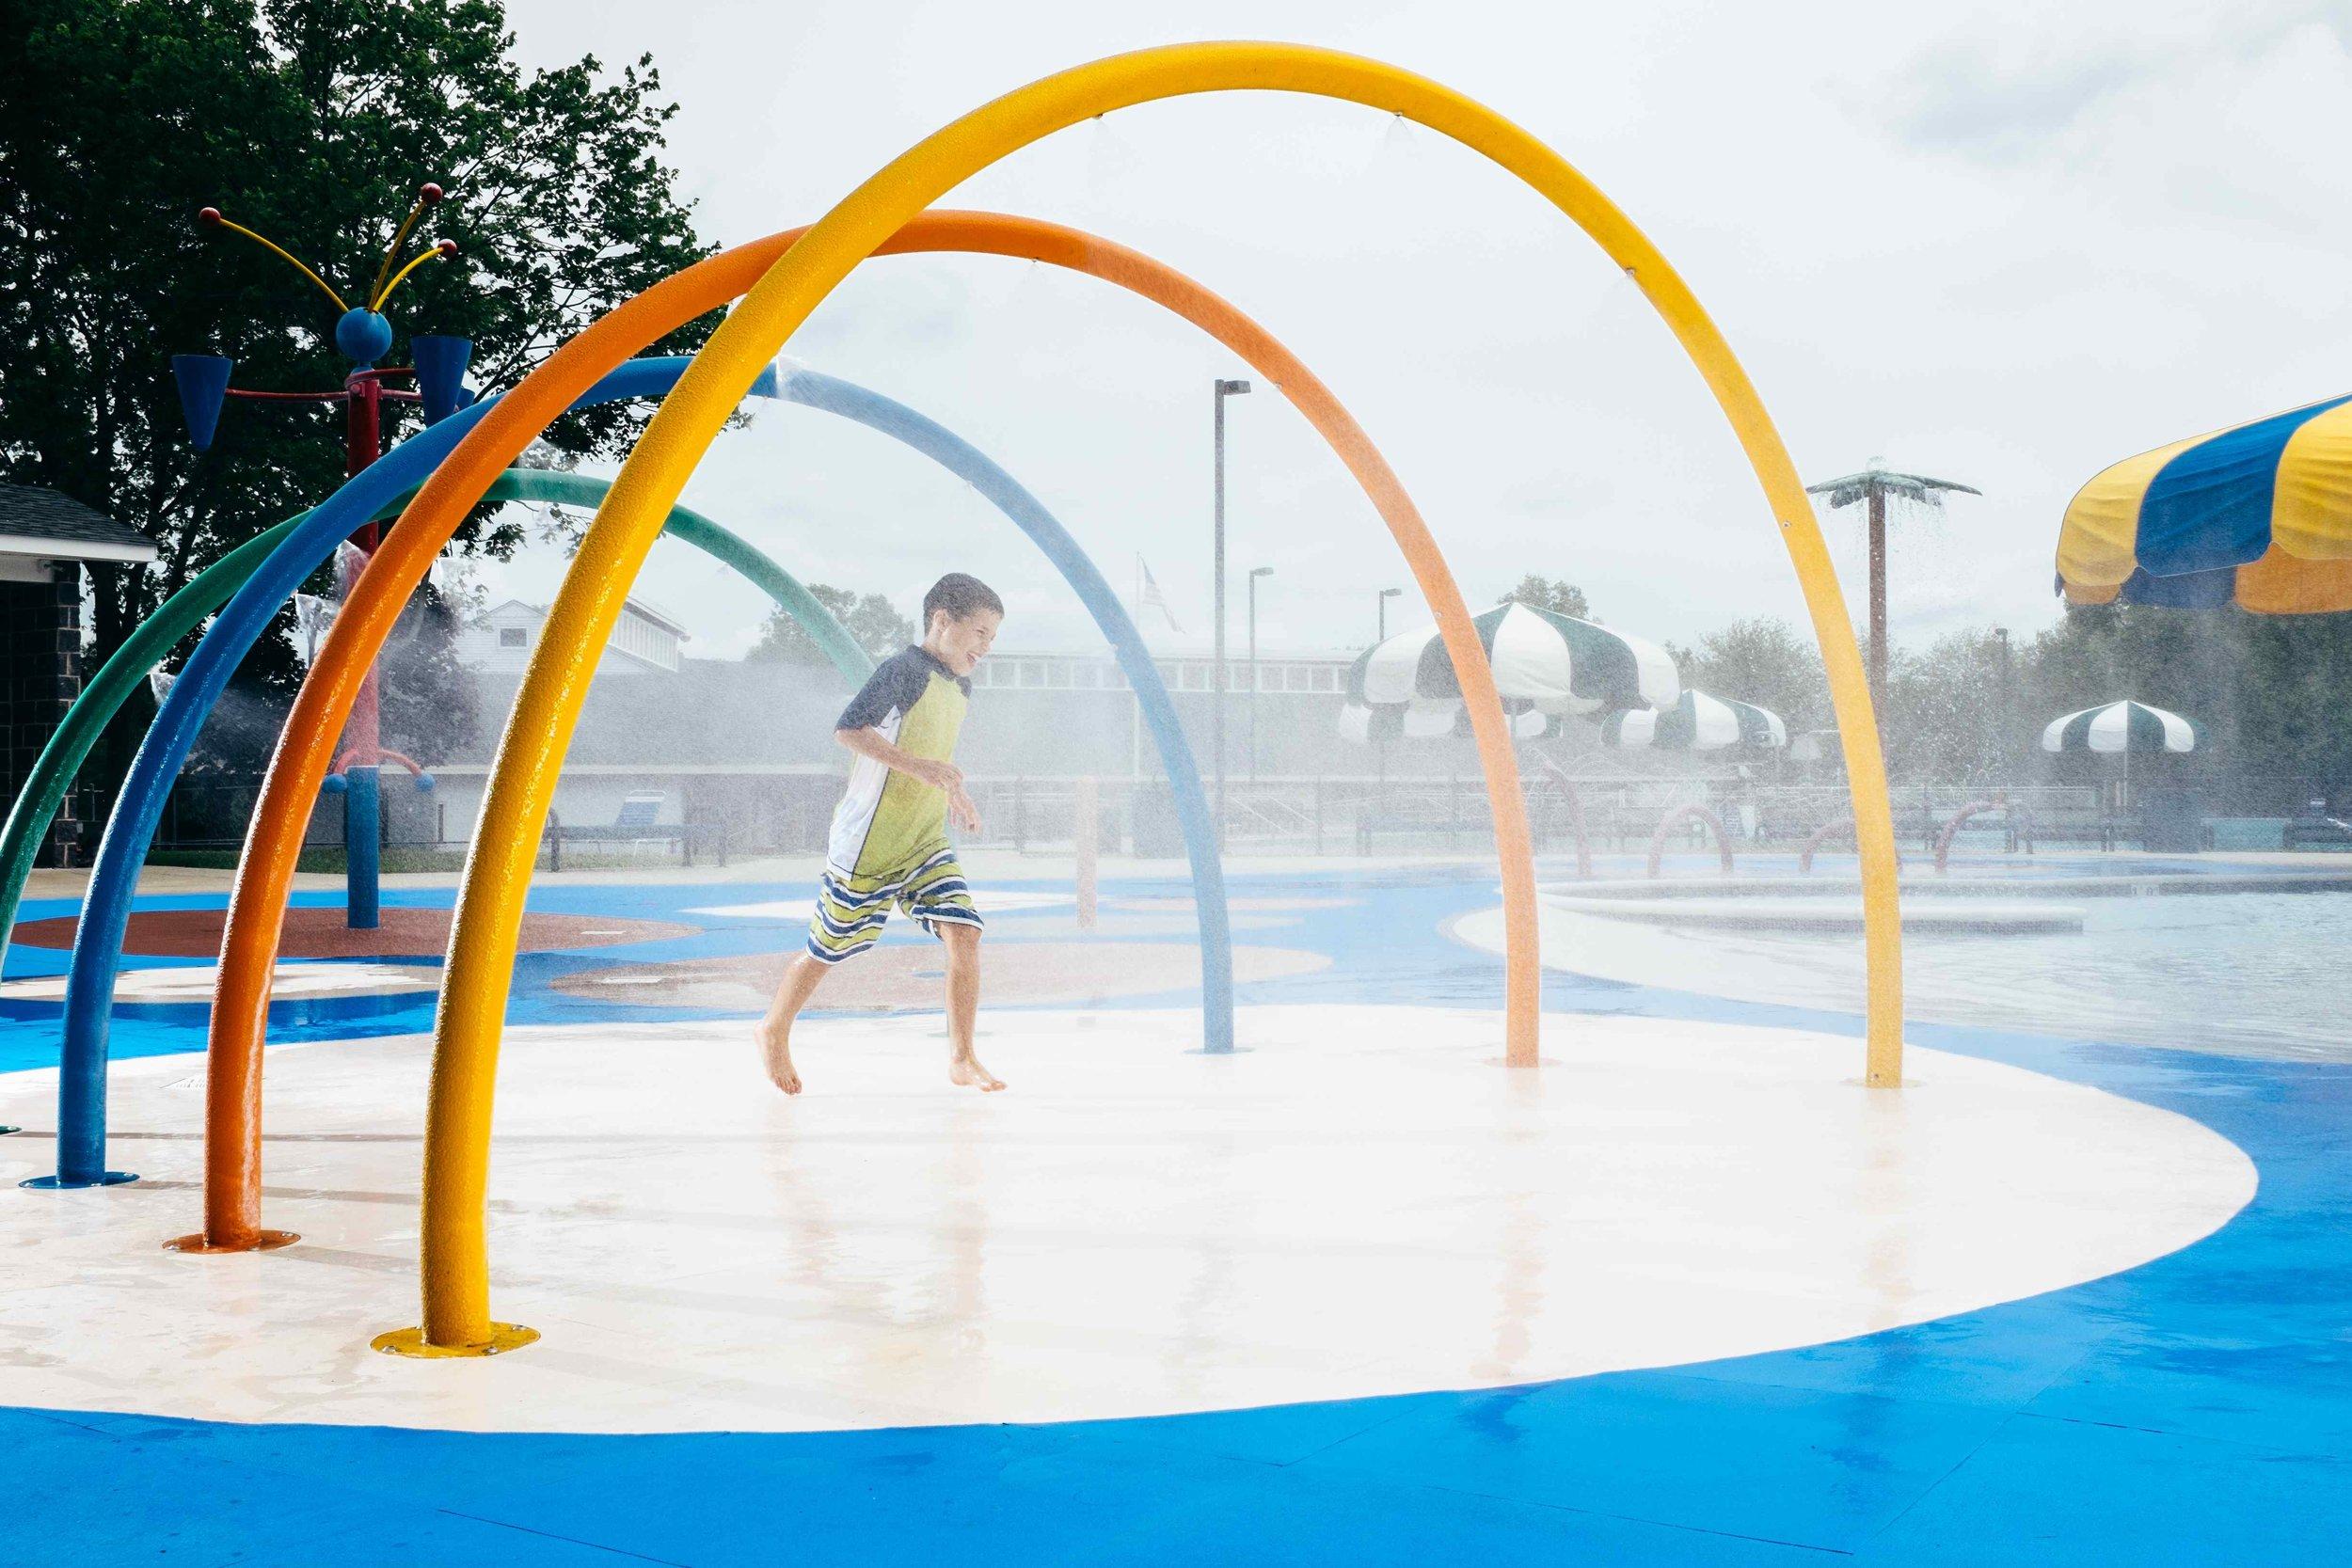 RGRphotography_Westfield_Memorial_Pool_Complex_NJ-4270.jpg